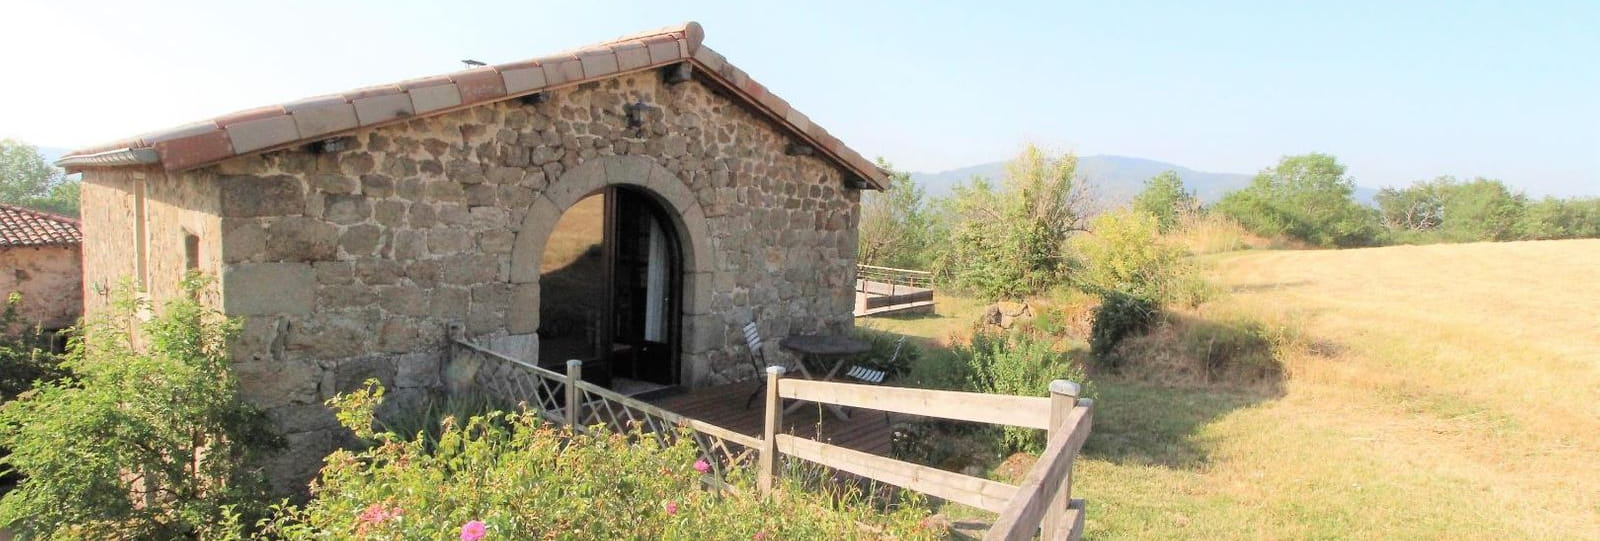 Couette et Tartine-La Cabane